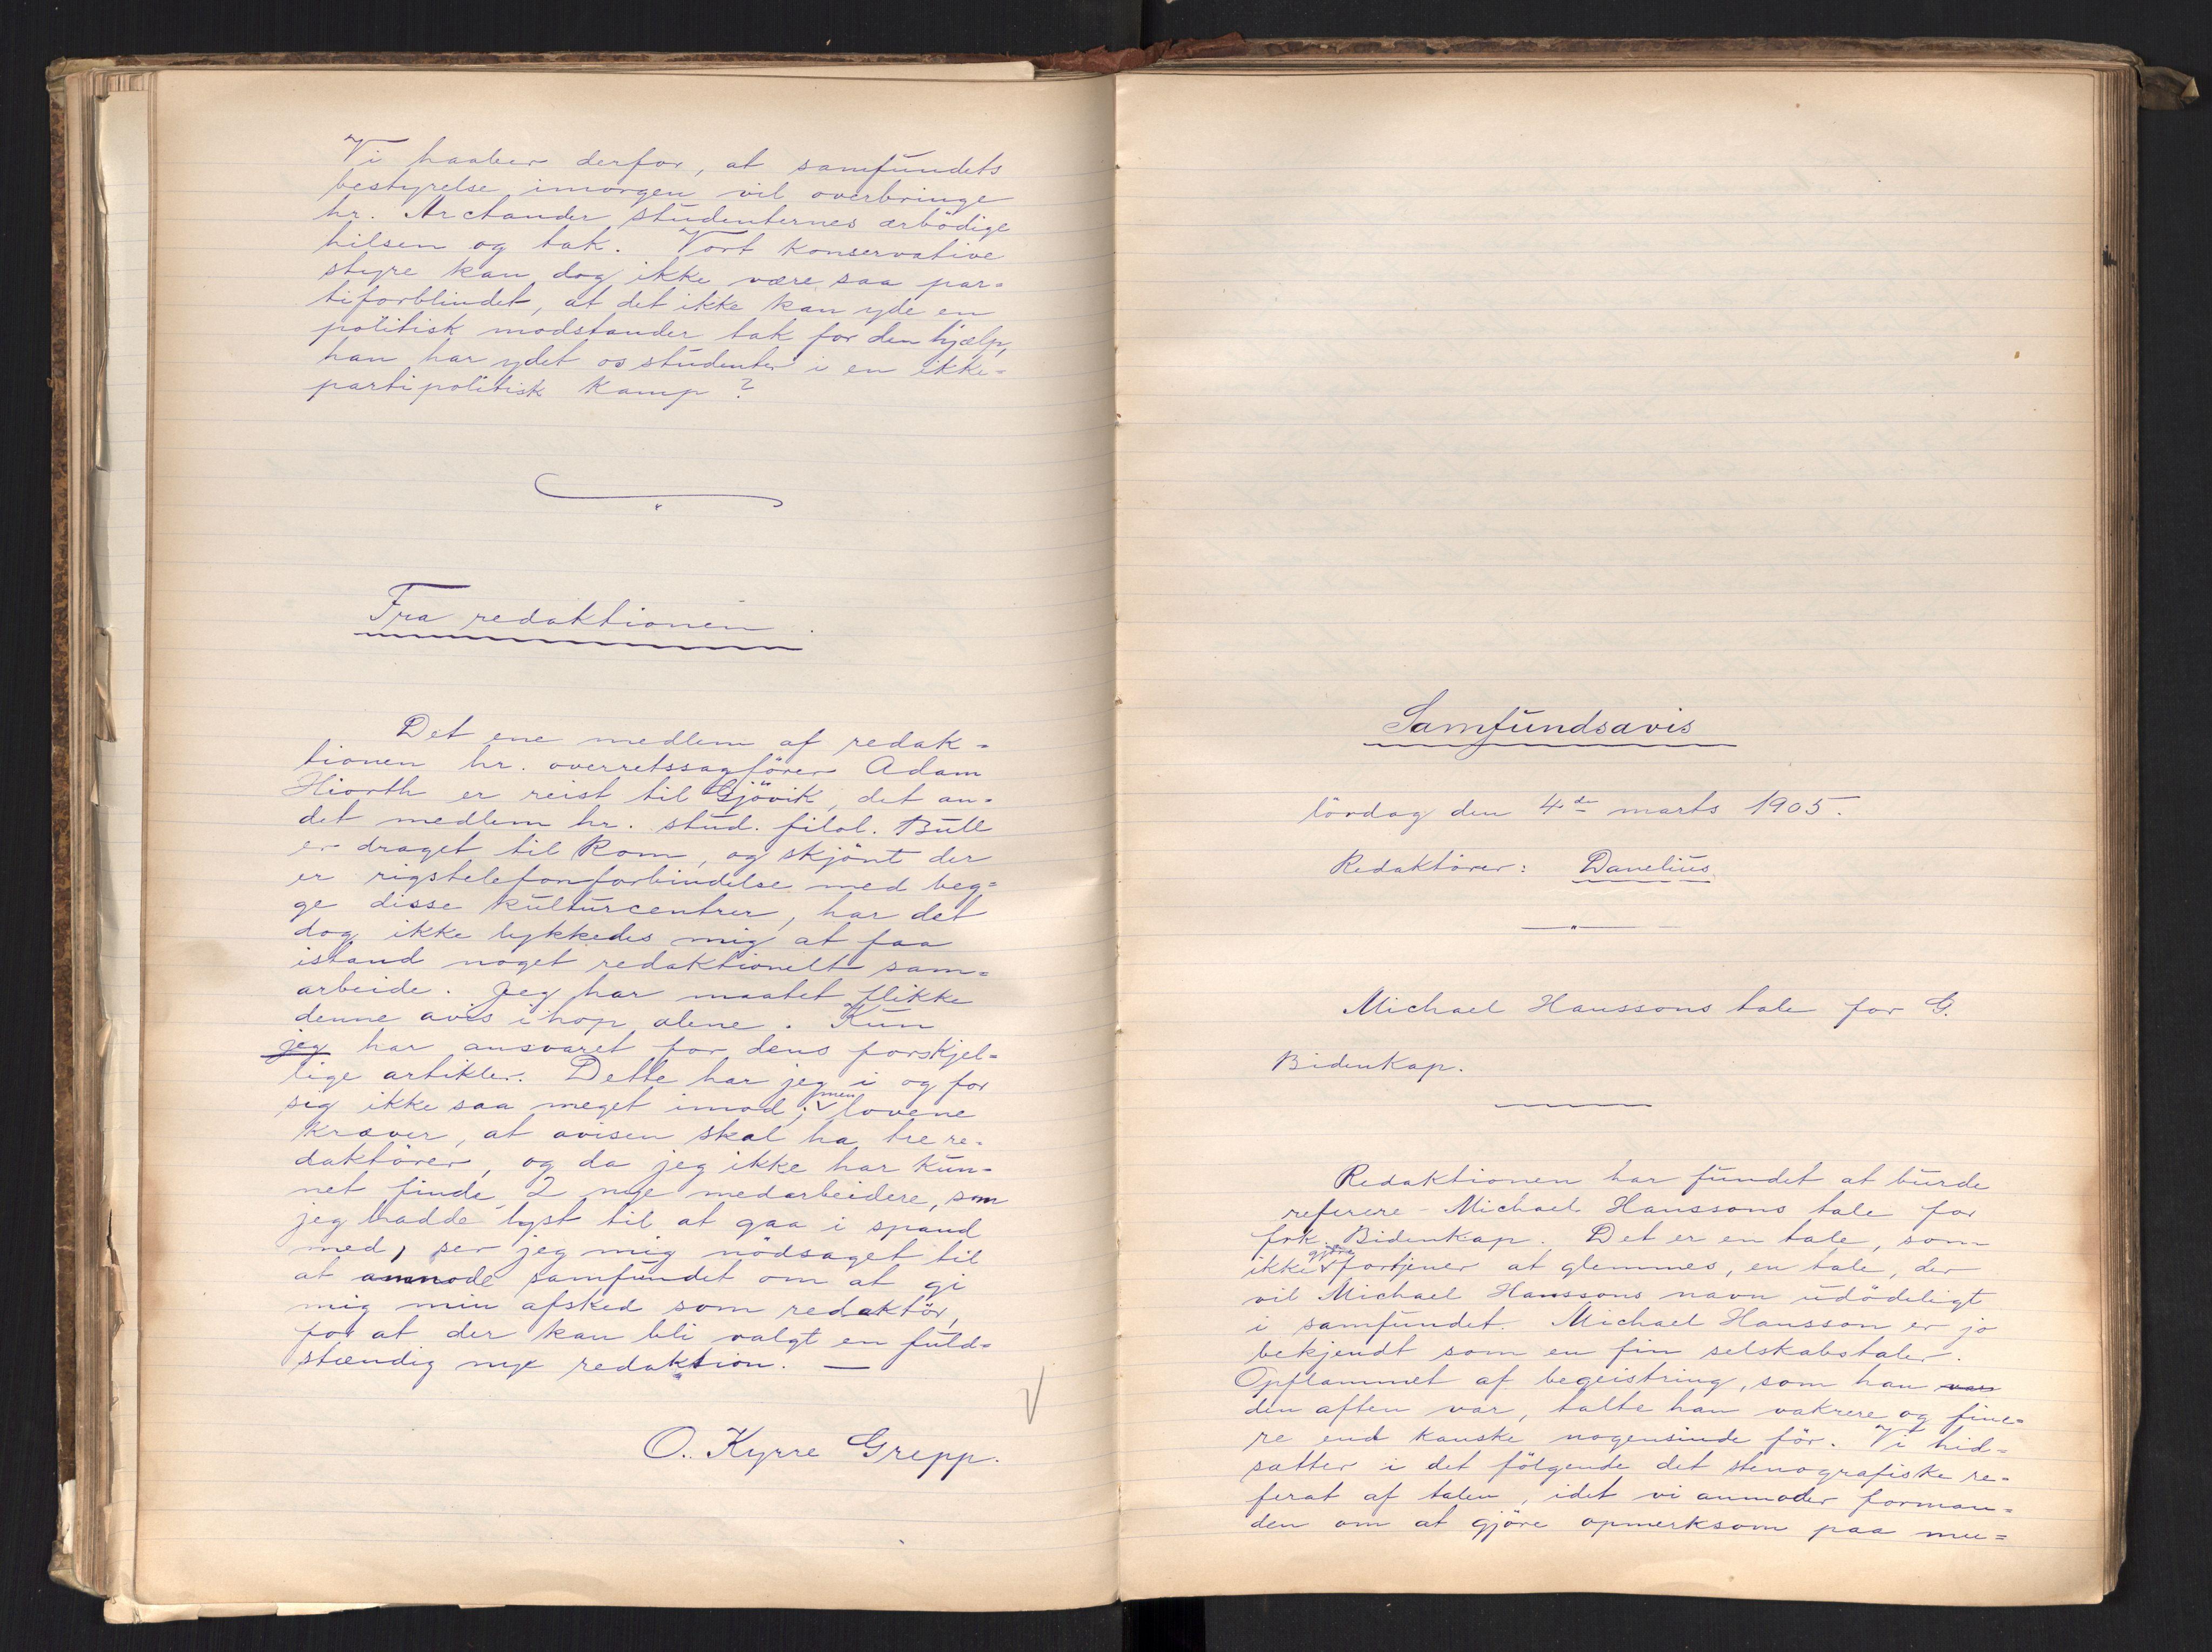 RA, Det Norske Studentersamfund, X/Xa/L0017, 1902-1904, s. 156